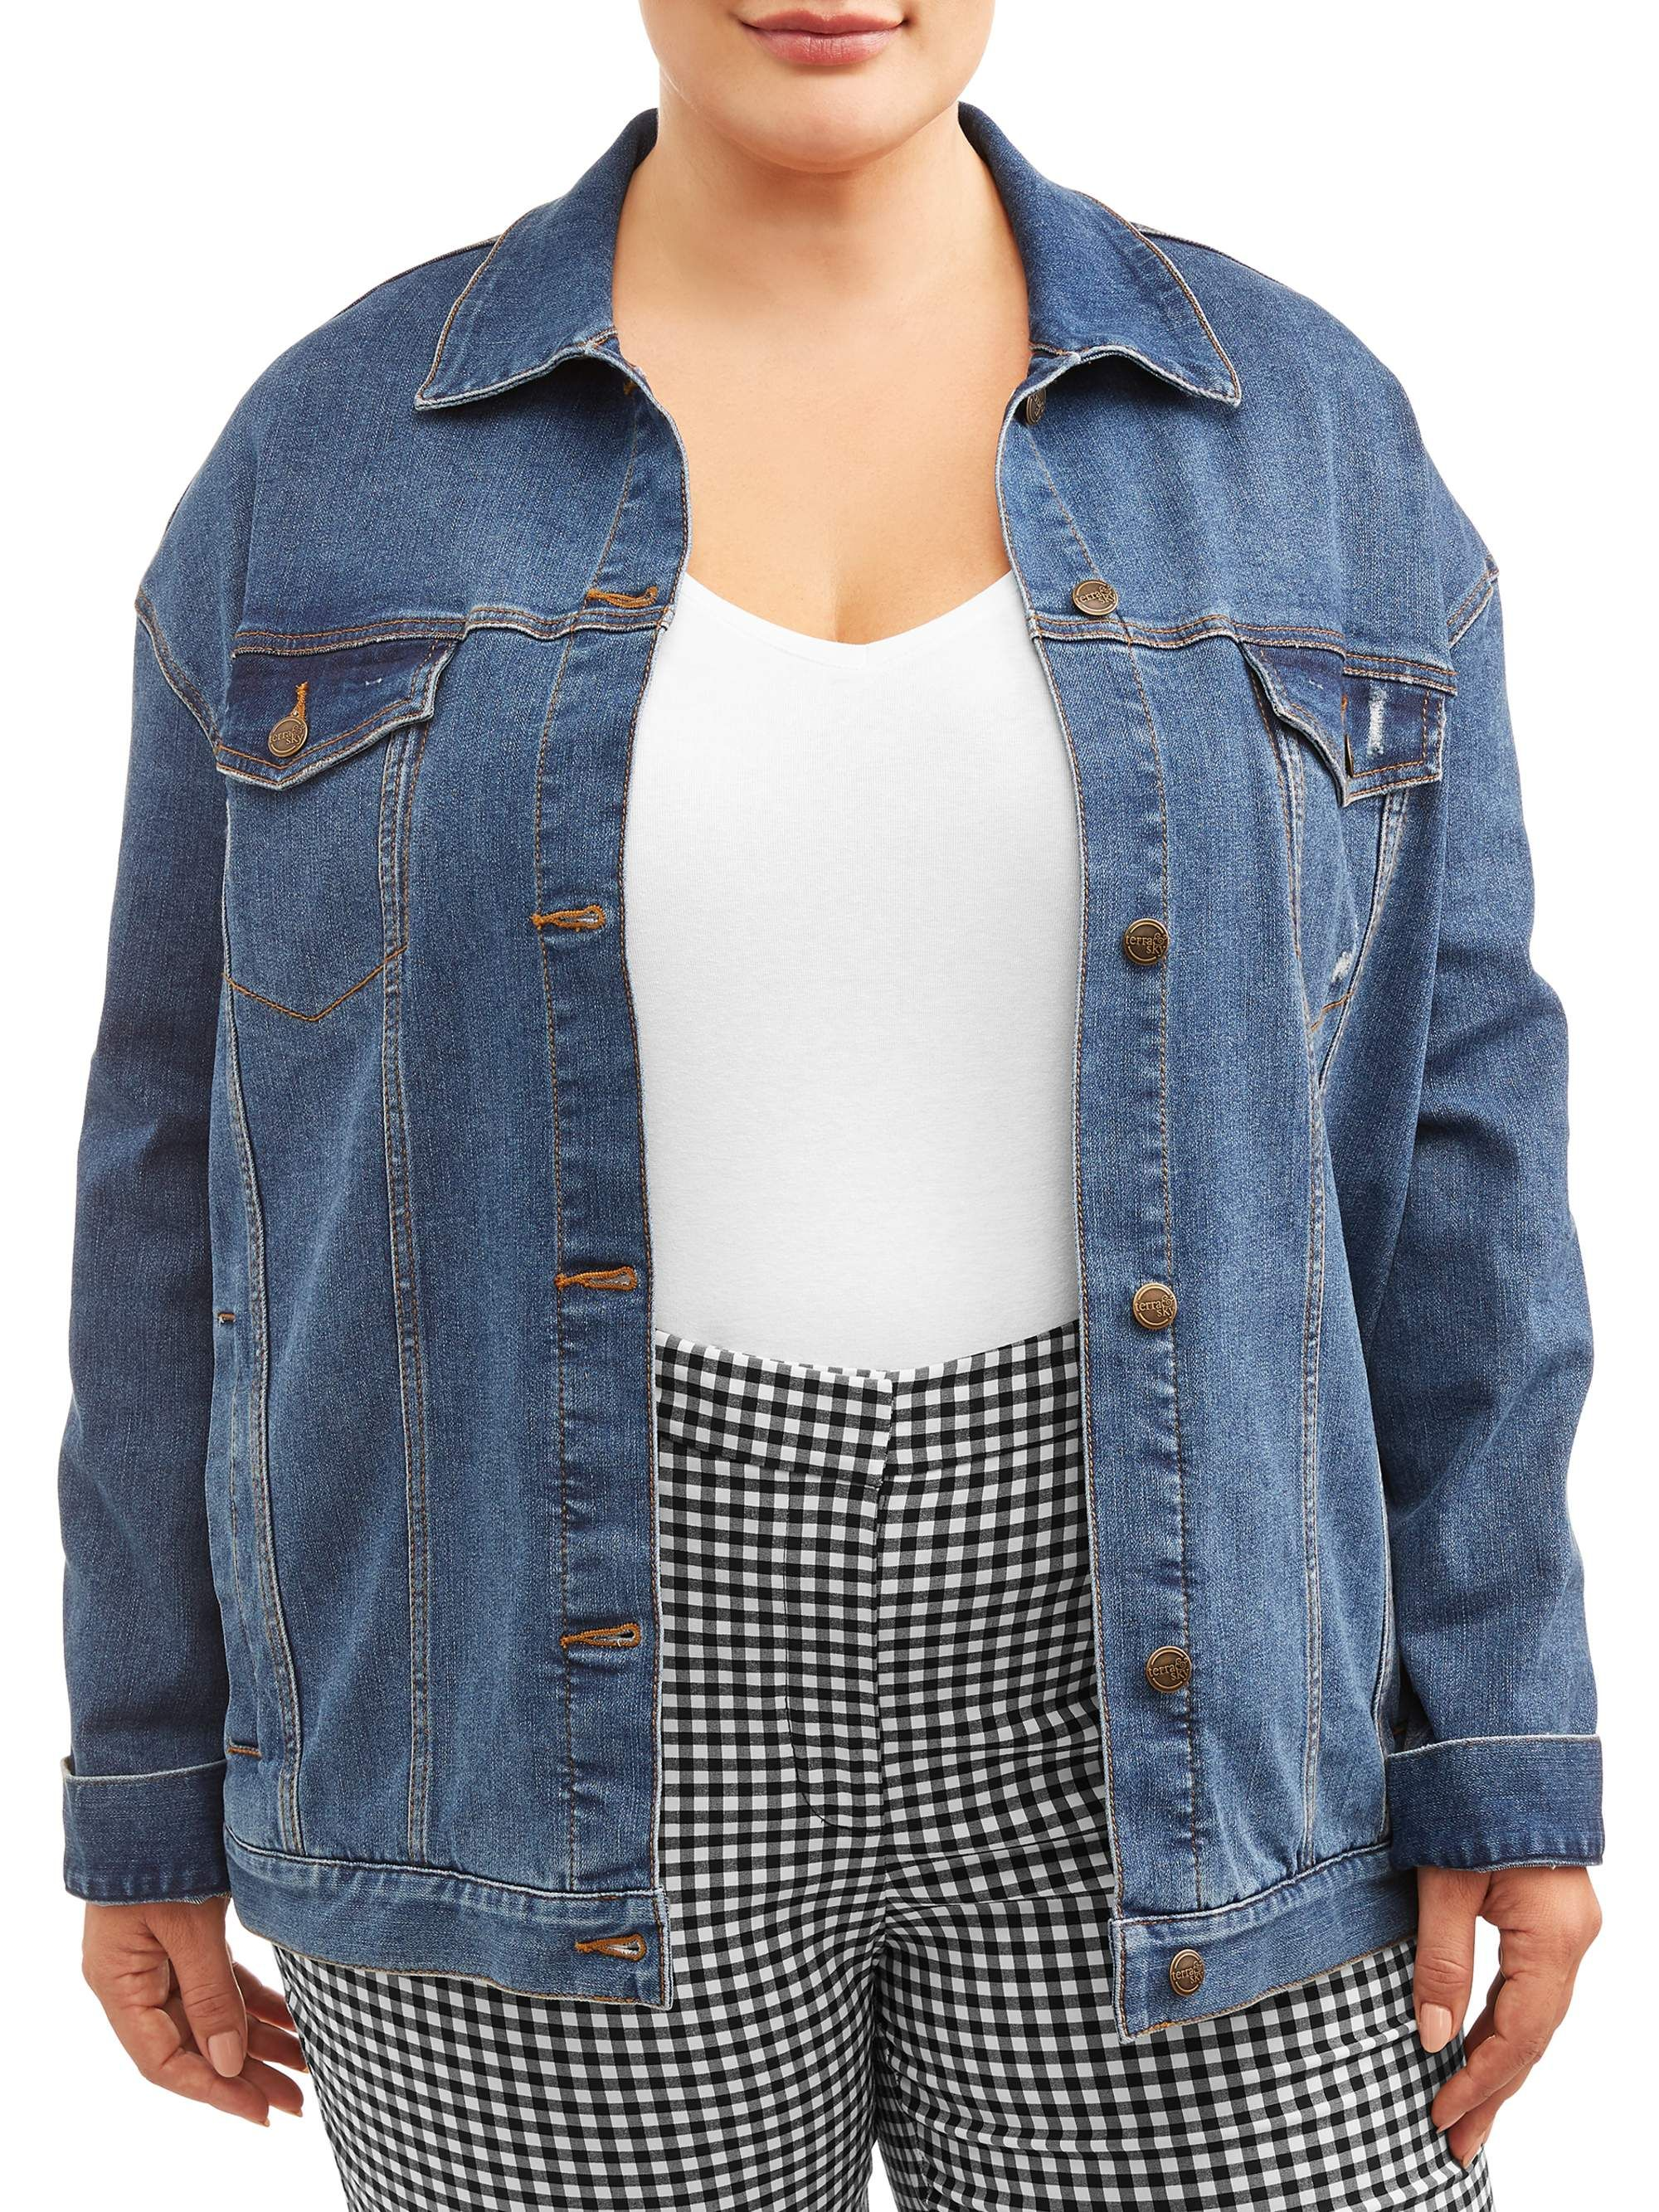 Terra Sky Terra Sky Women S Plus Size Everyday Essential Denim Jacket Walmart Com Denim Jacket Denim Denim Jacket Women [ 2667 x 2000 Pixel ]